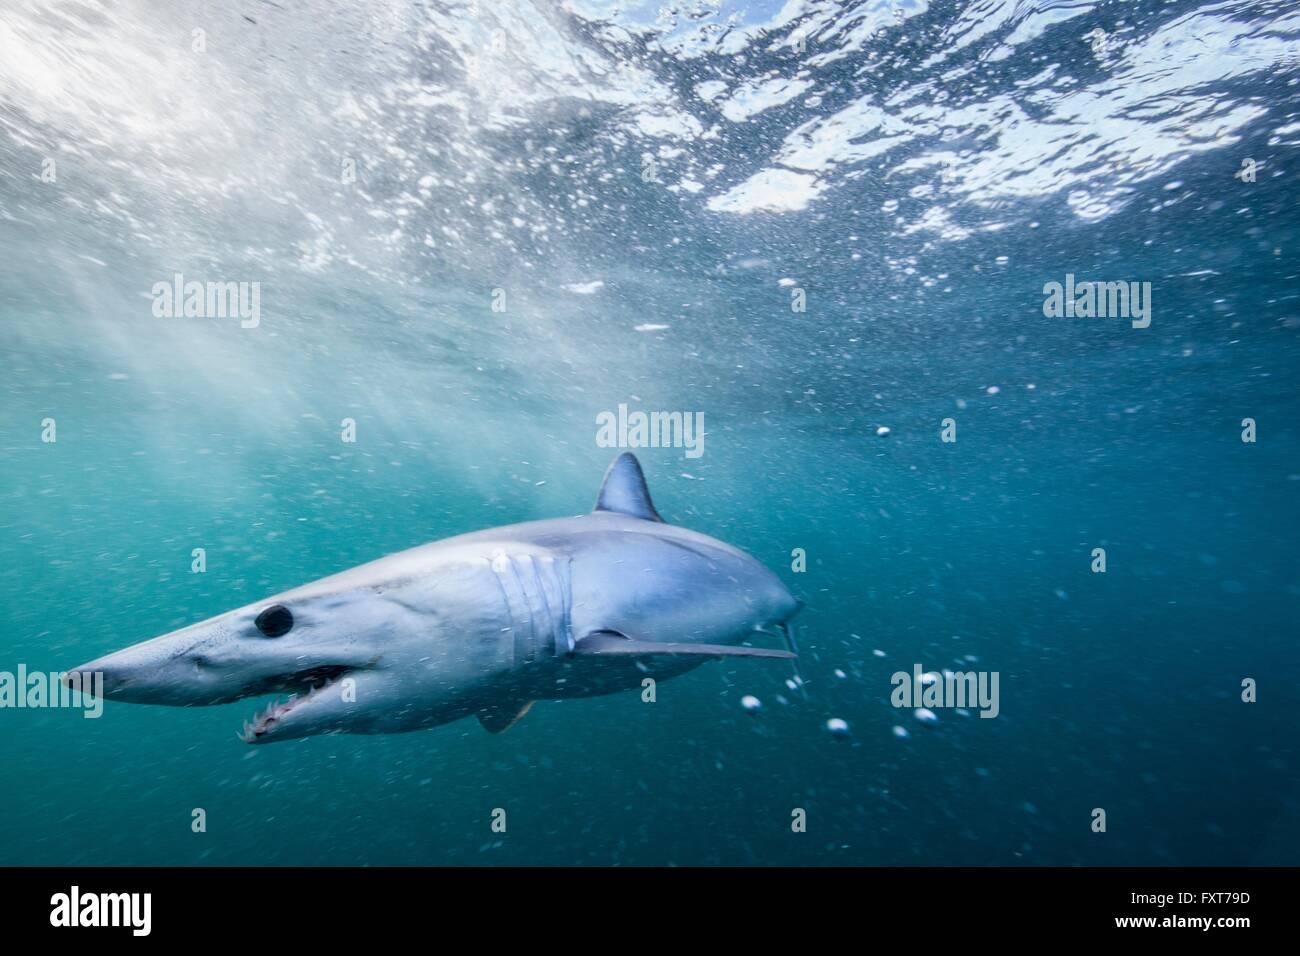 Underwater view of menacing shortfin mako shark (Isurus oxyrinchus) swimming in sea, West Coast, New Zealand - Stock Image